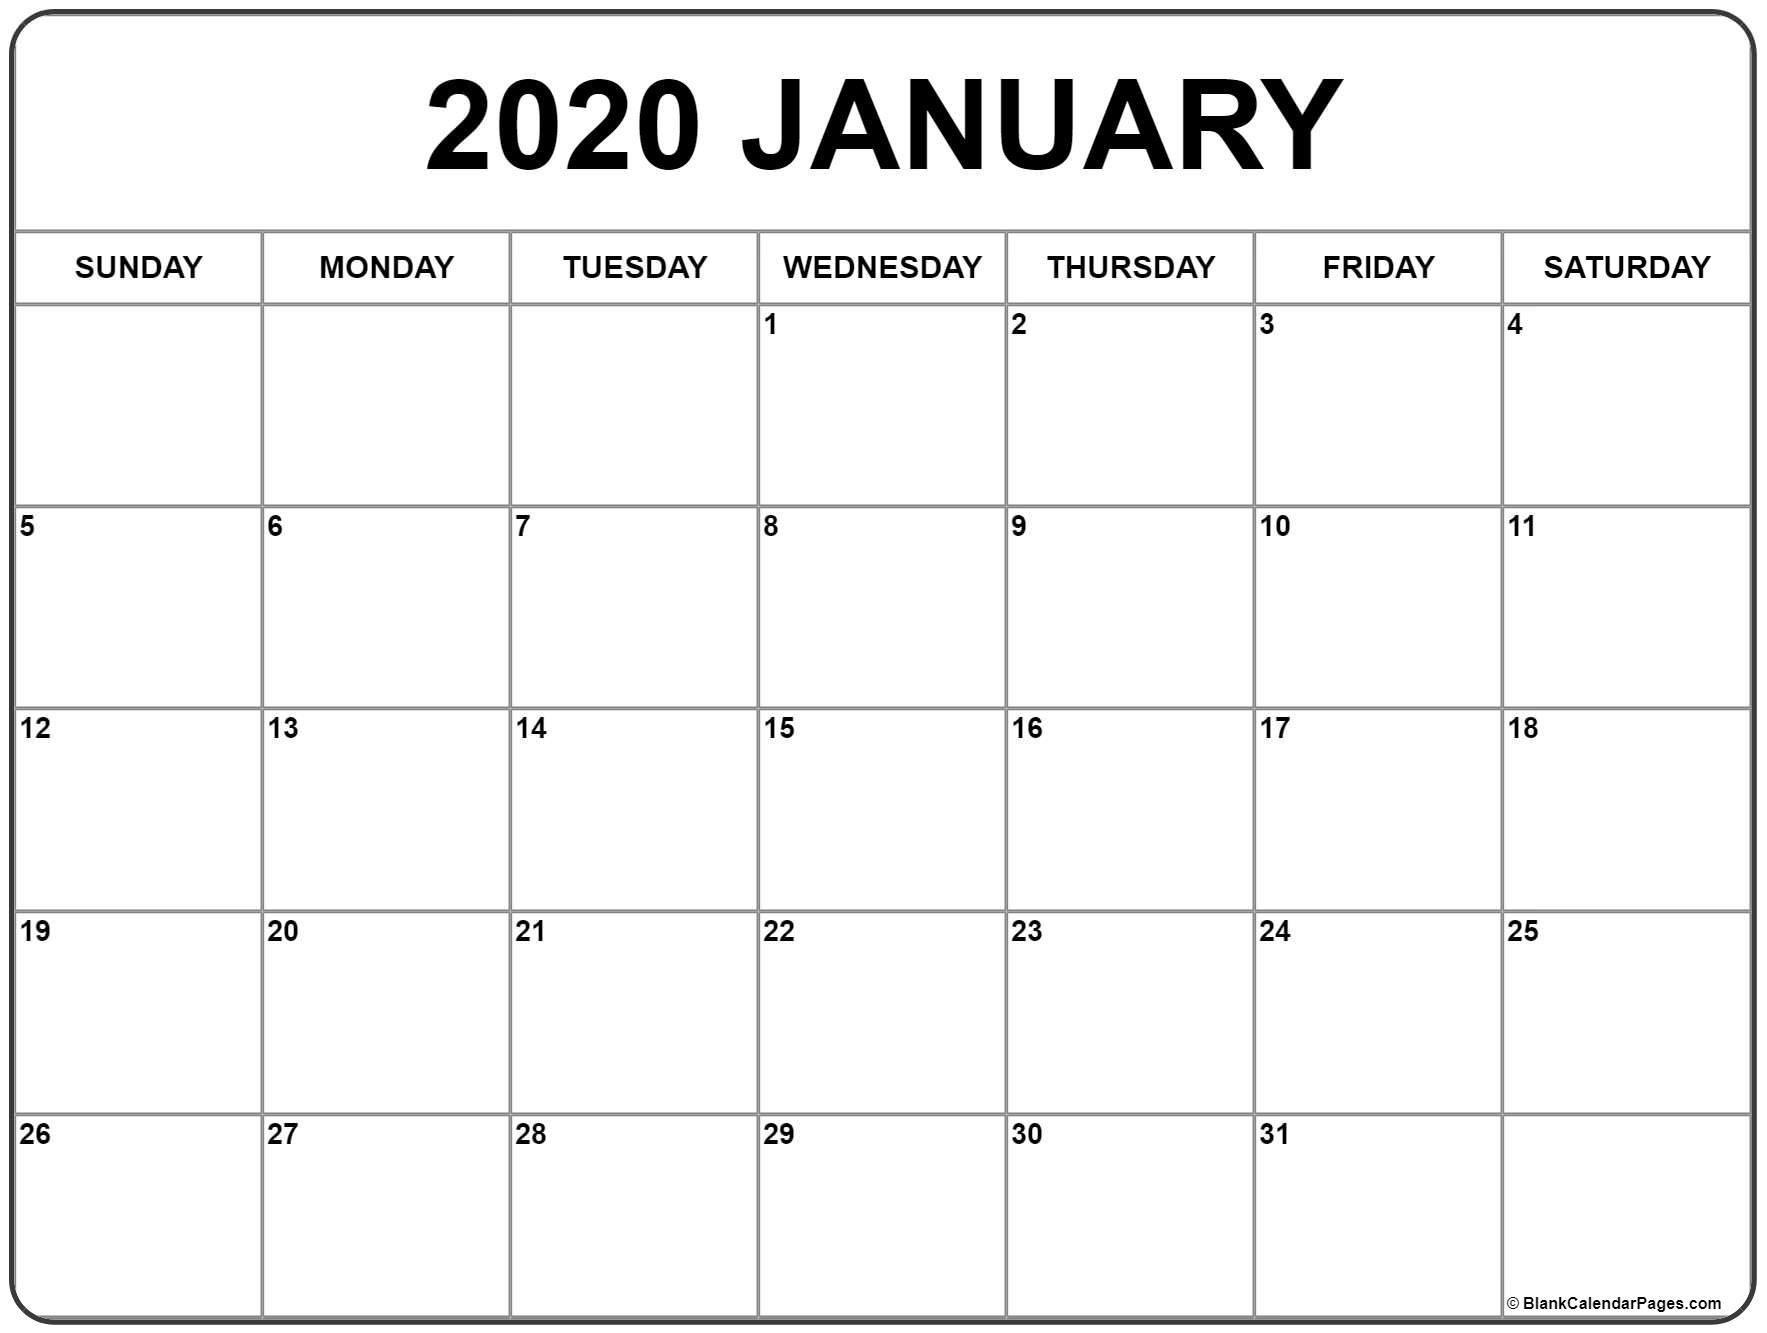 Printable Calendar 2020 With Notes - Wpa.wpart.co